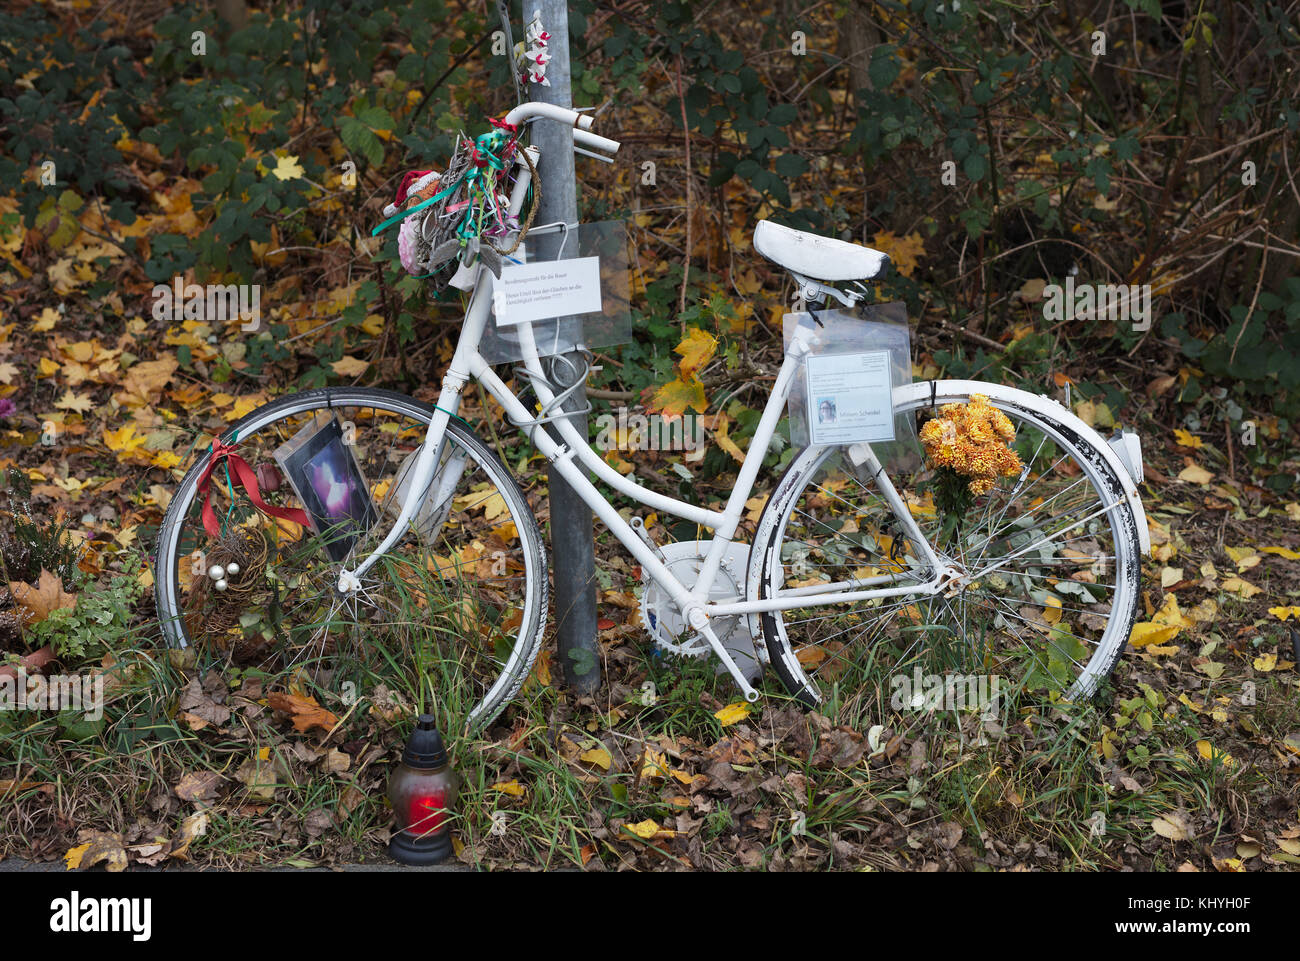 ghost-bike-remembering-miriam-scheidel-1